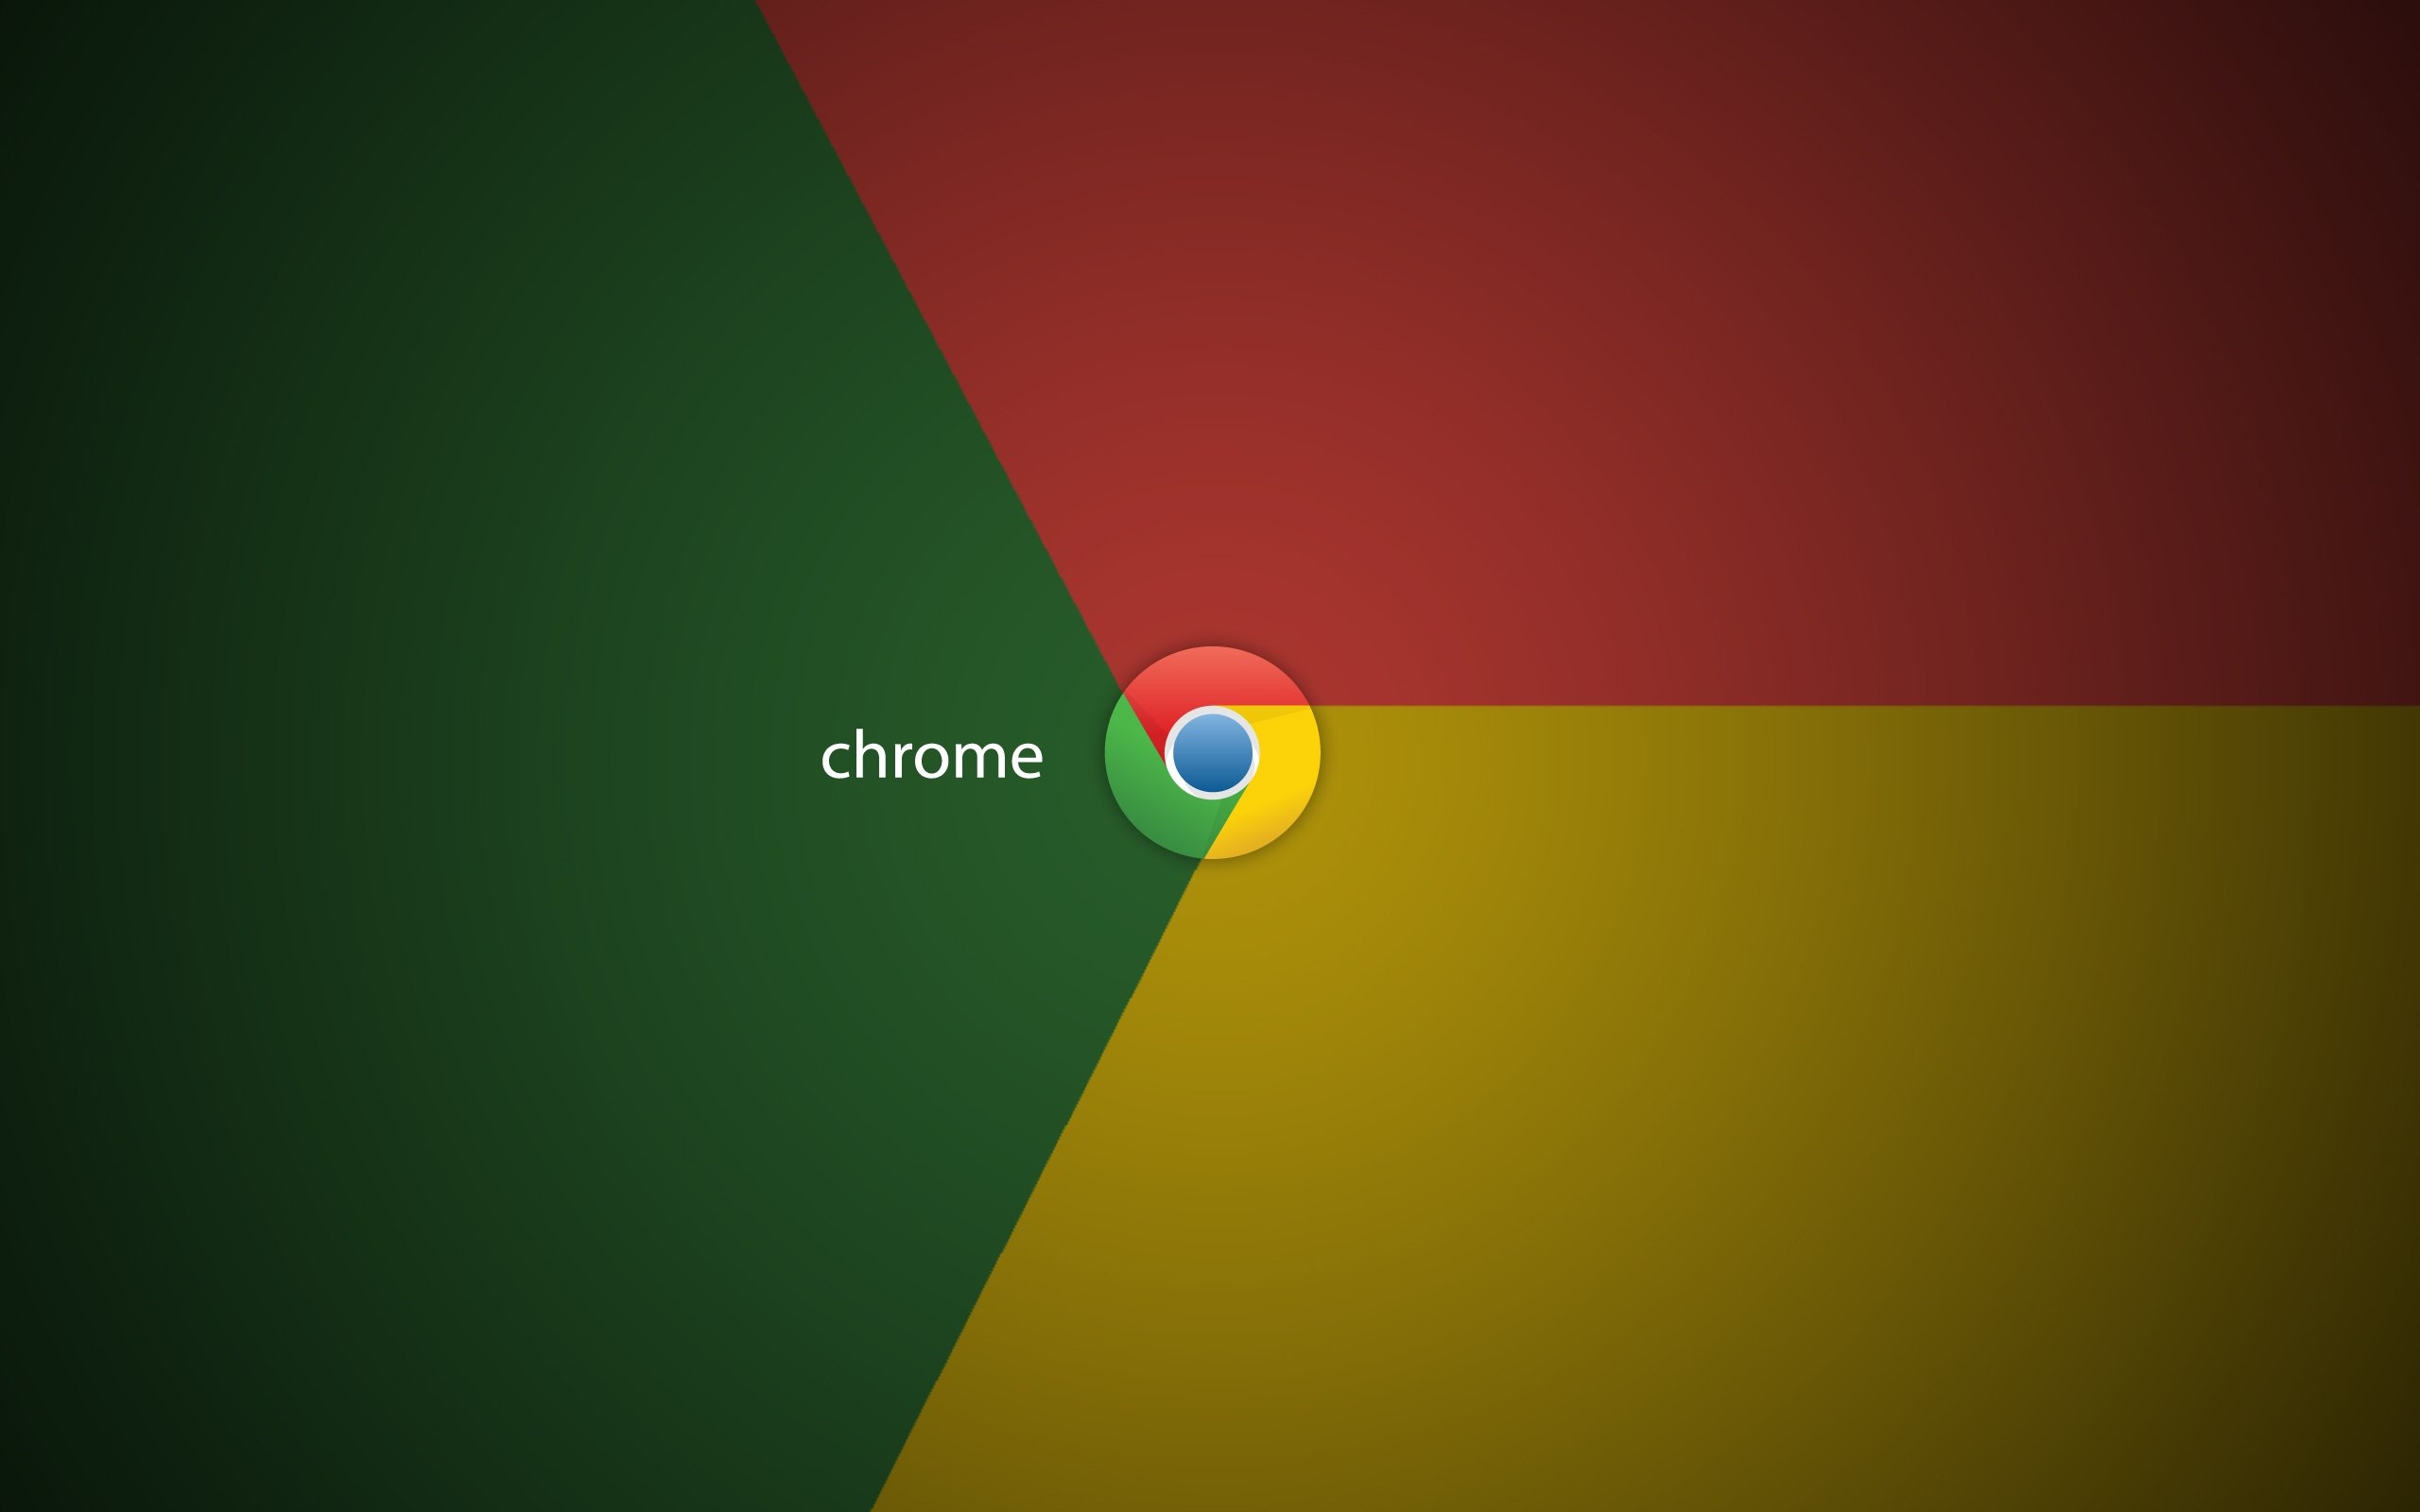 google chrome wallpaper 2560x1600